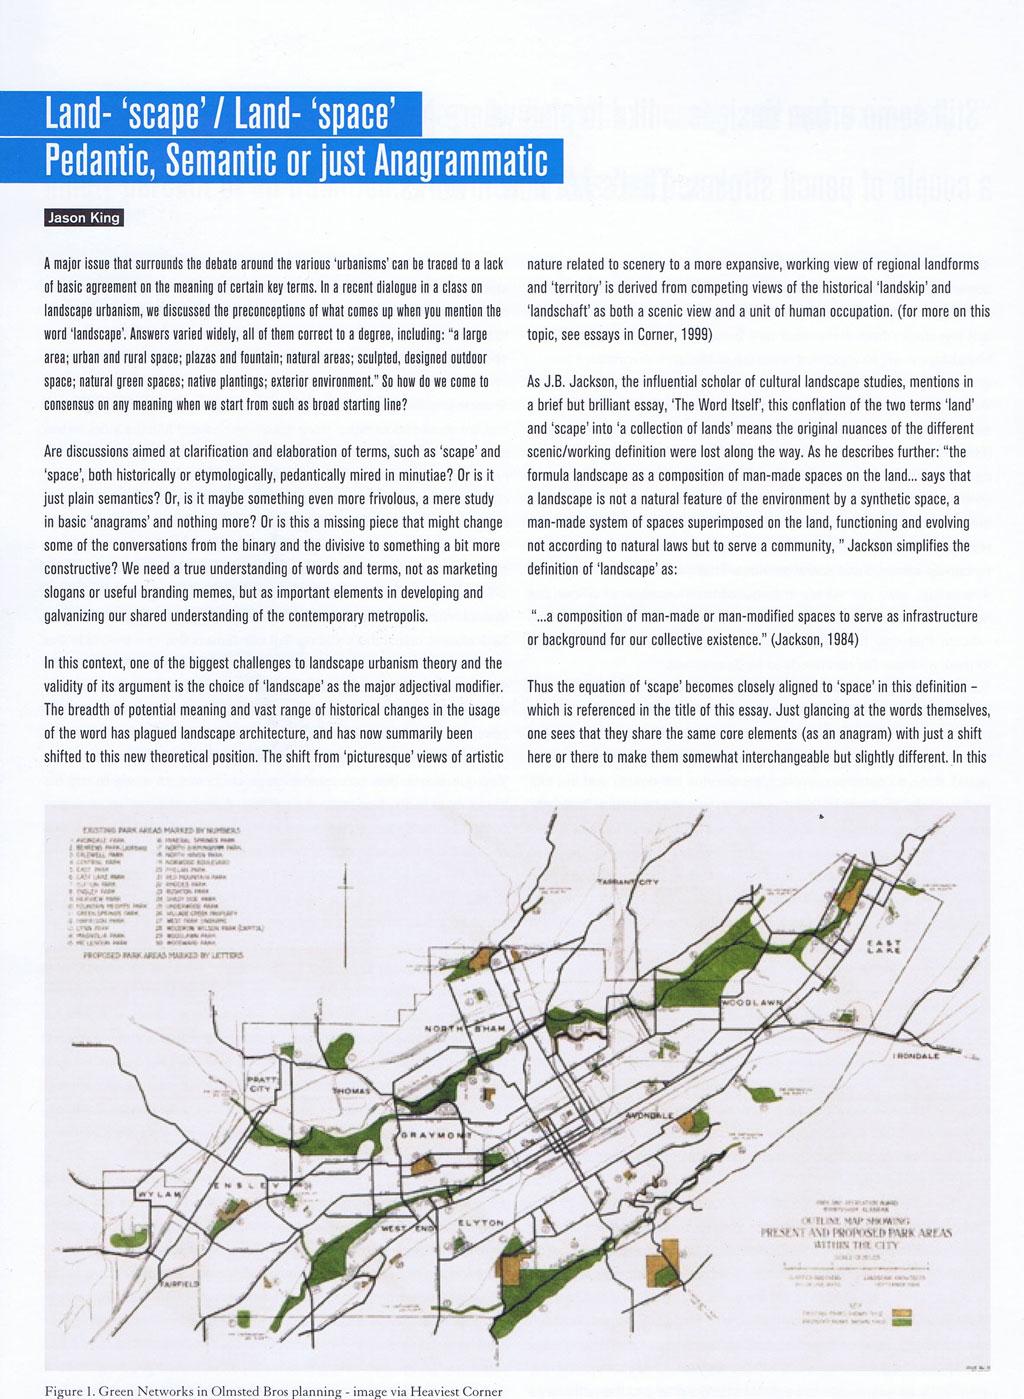 006 Landscape Architecture Essay Atlantis Web Stunning Argumentative Topics Full